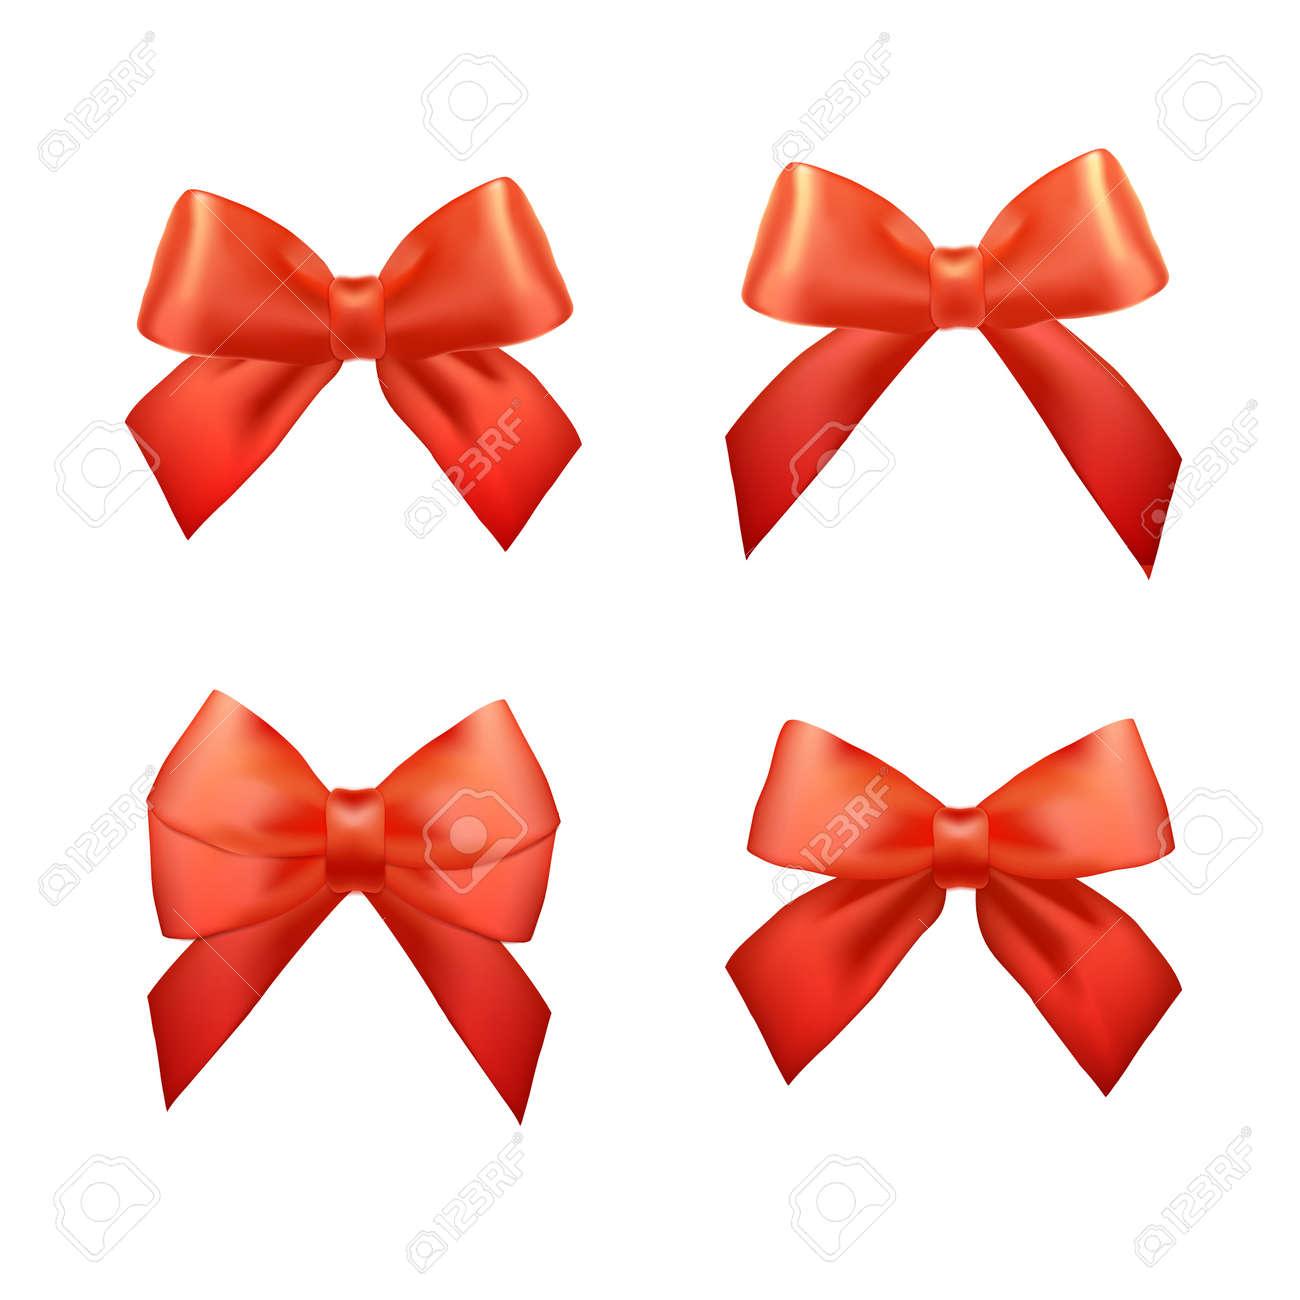 ribbons set for christmas gifts red gift vector bows with ribbons rh 123rf com free vector bowling pins free vector bowling ball